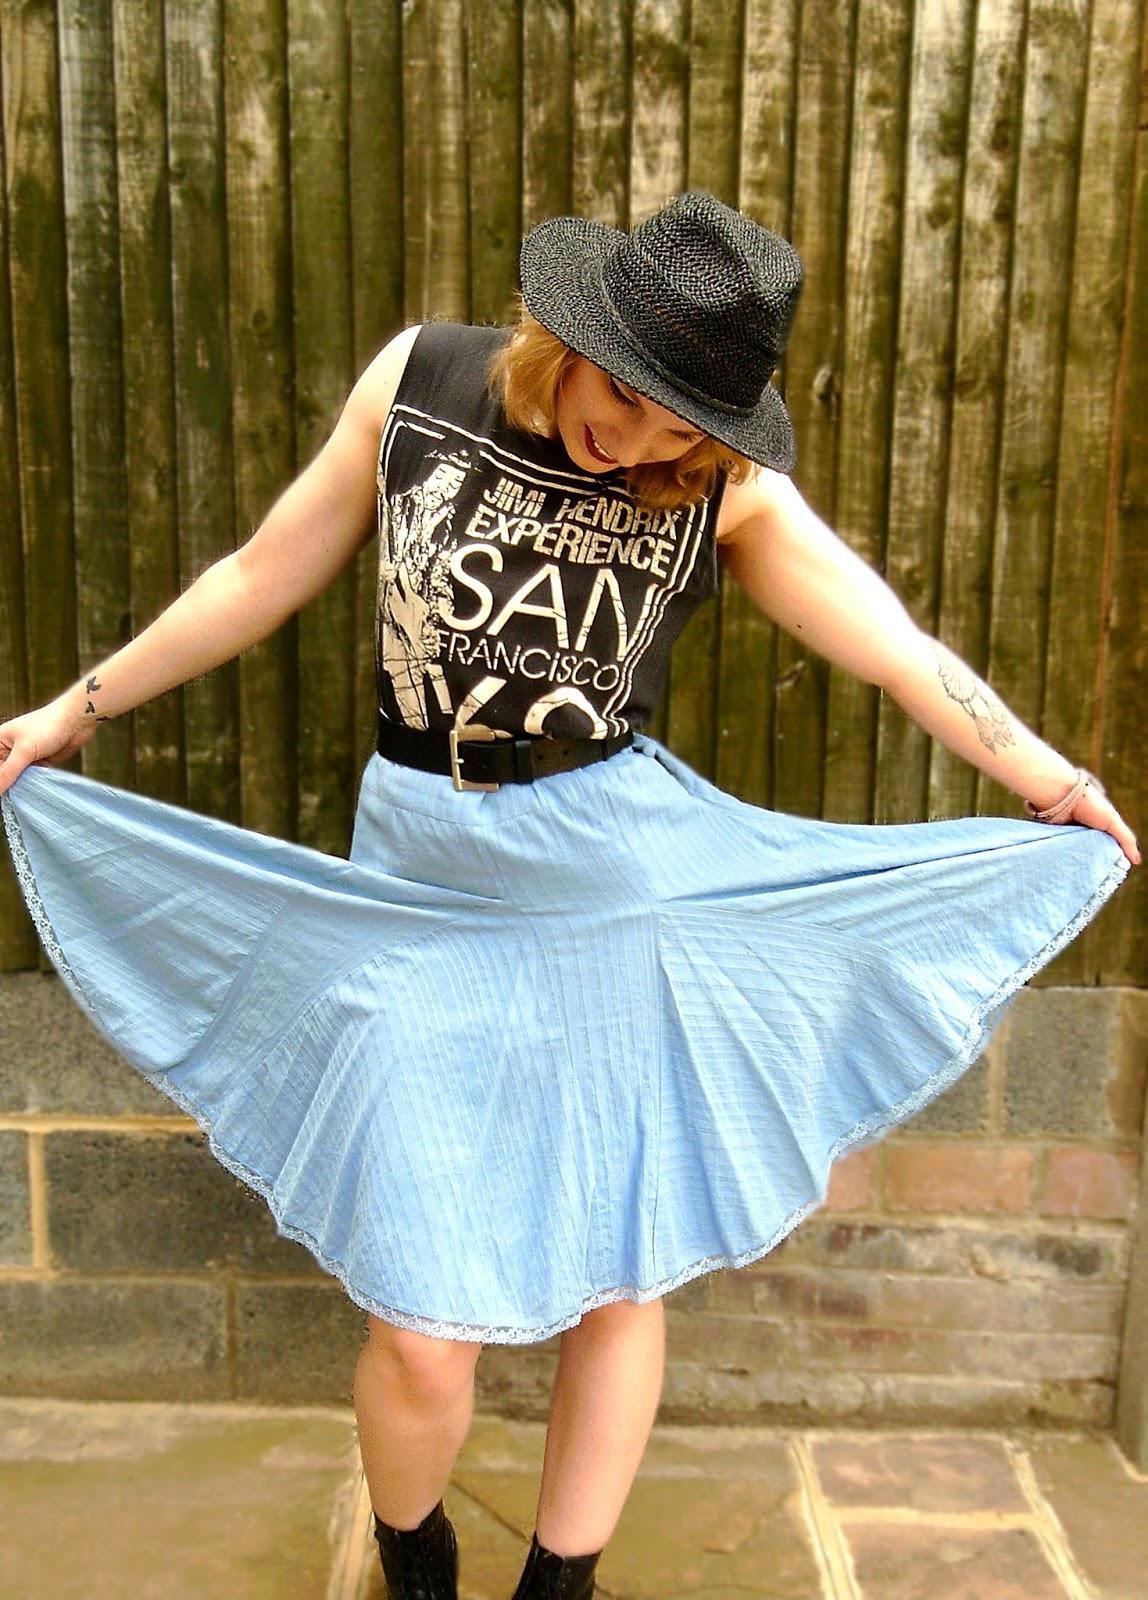 midi skirt, bohemian, rock chick, doctor martin's, dm's, bowler hat, choker